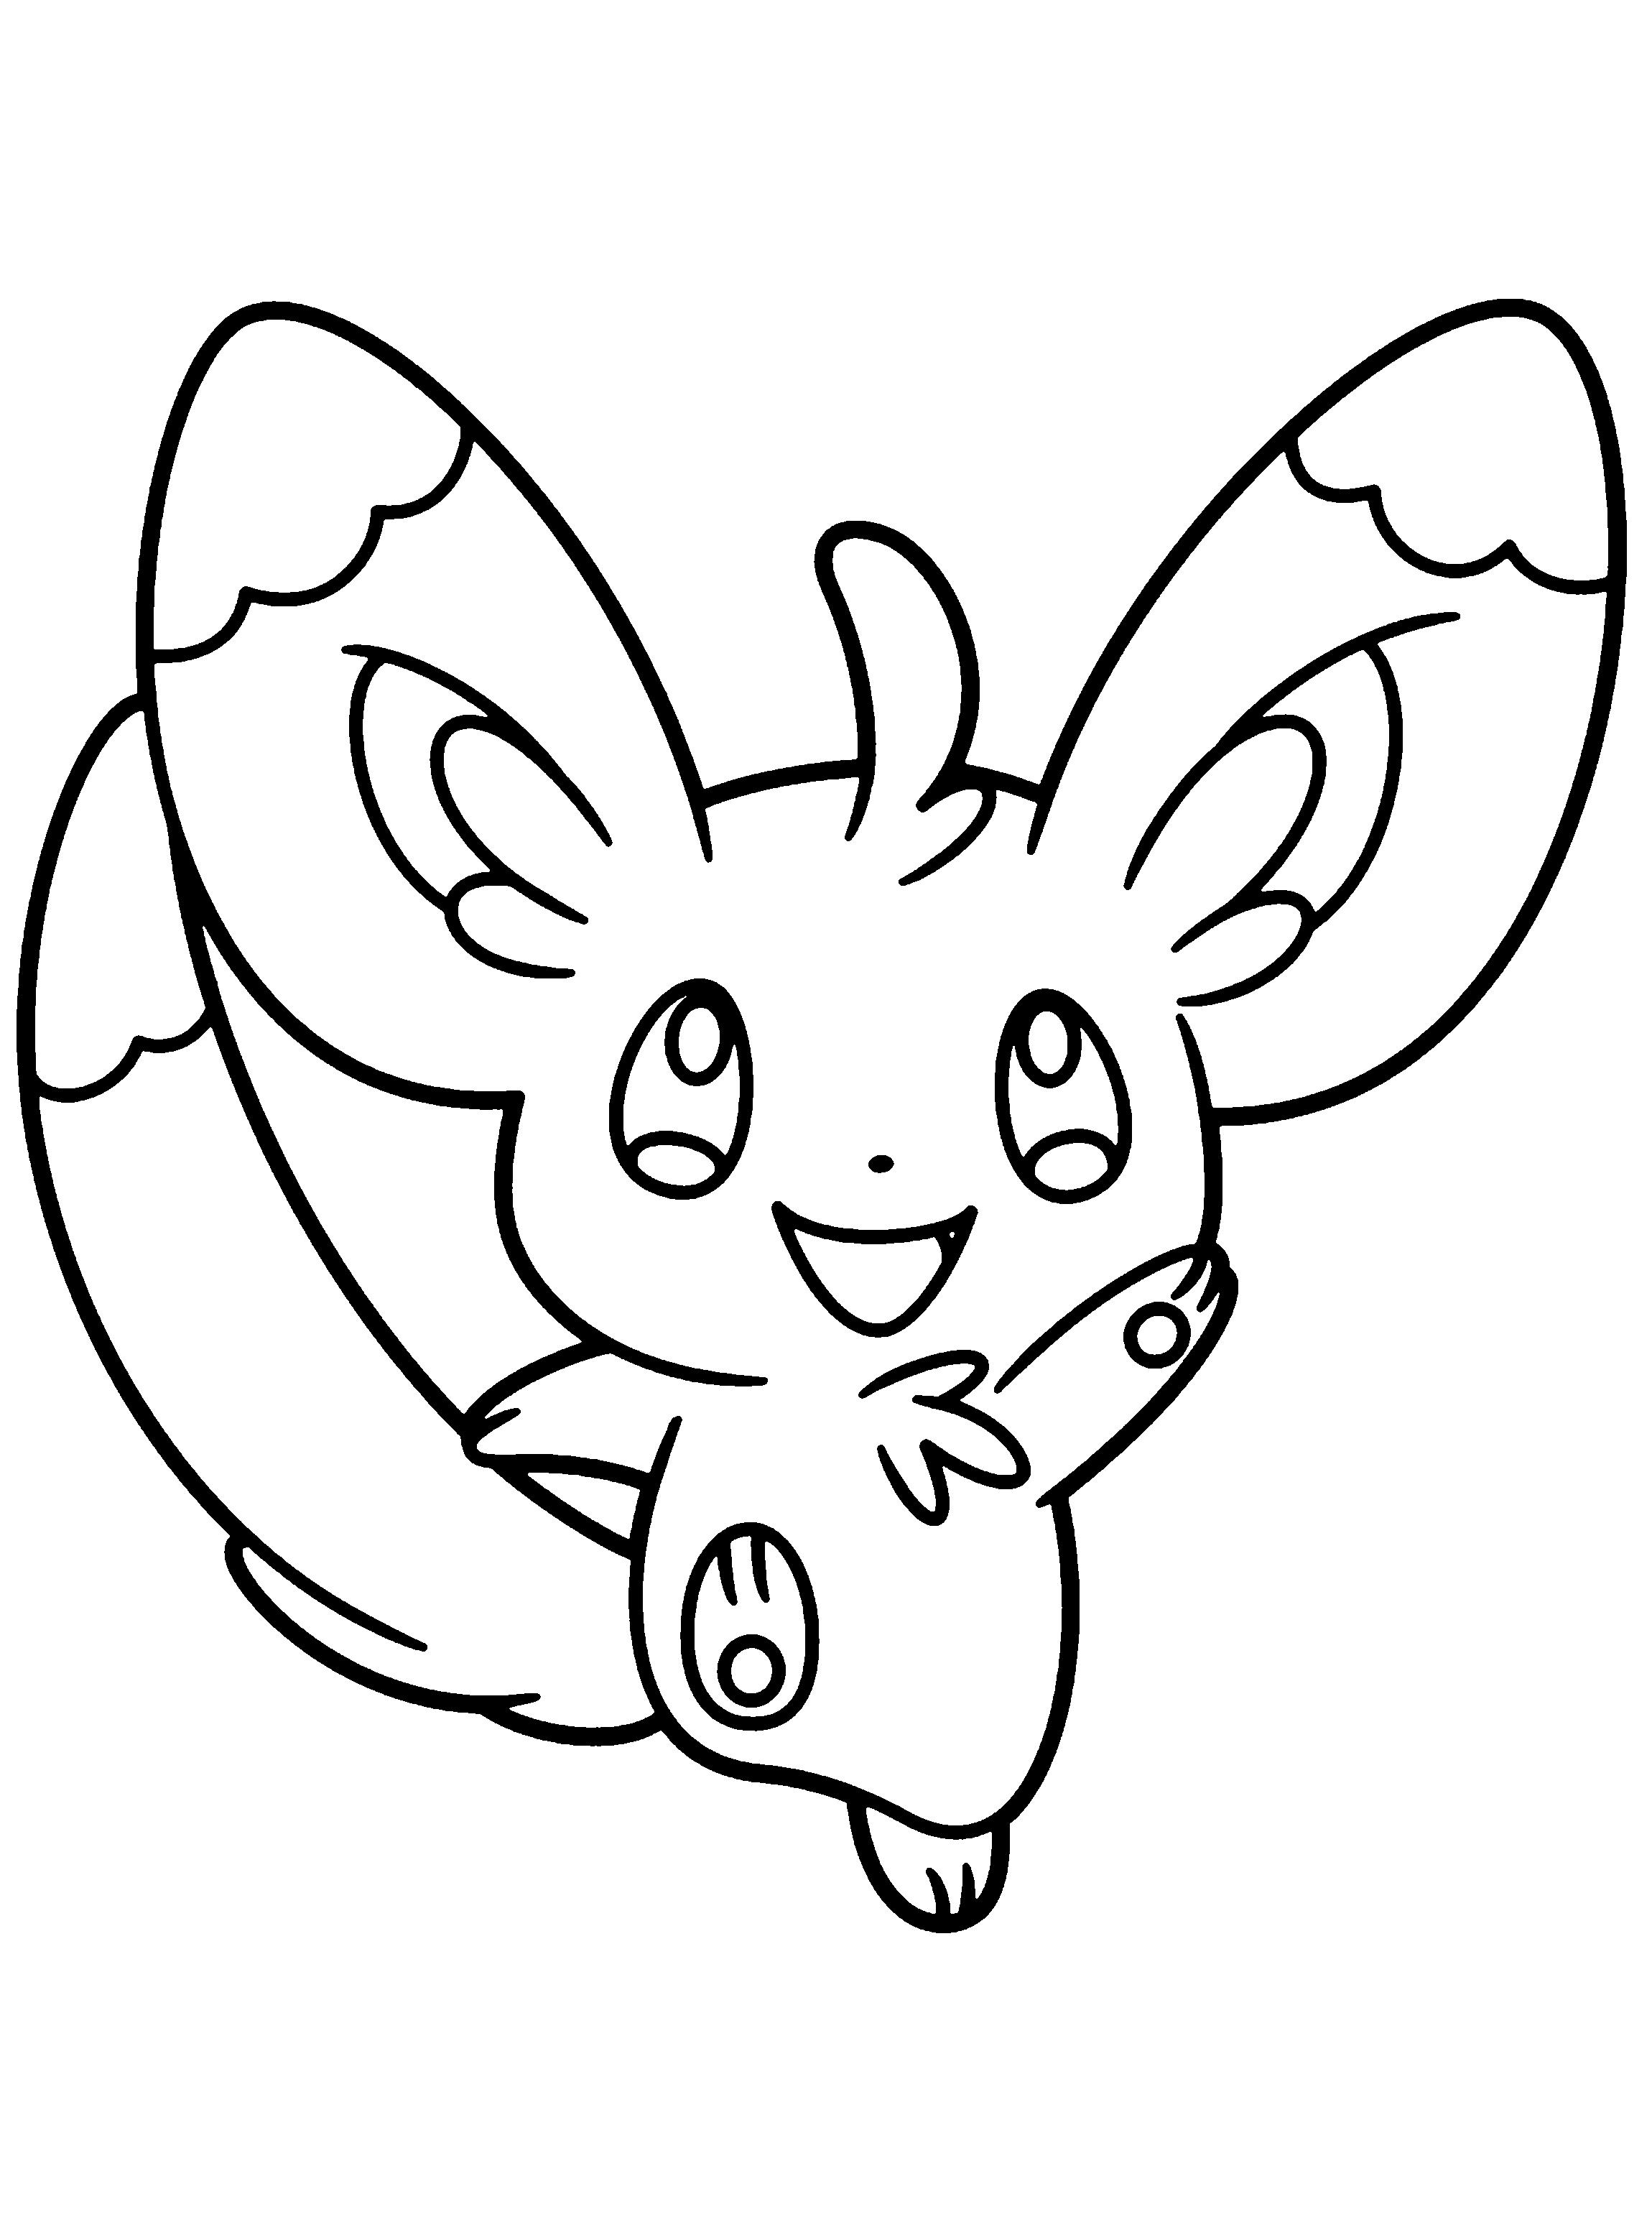 Kleurplaten Pokemon Snivy.Pokemon Kleurplaten Snivy Ausmalbilder Pokmon Schwarze Und Weie